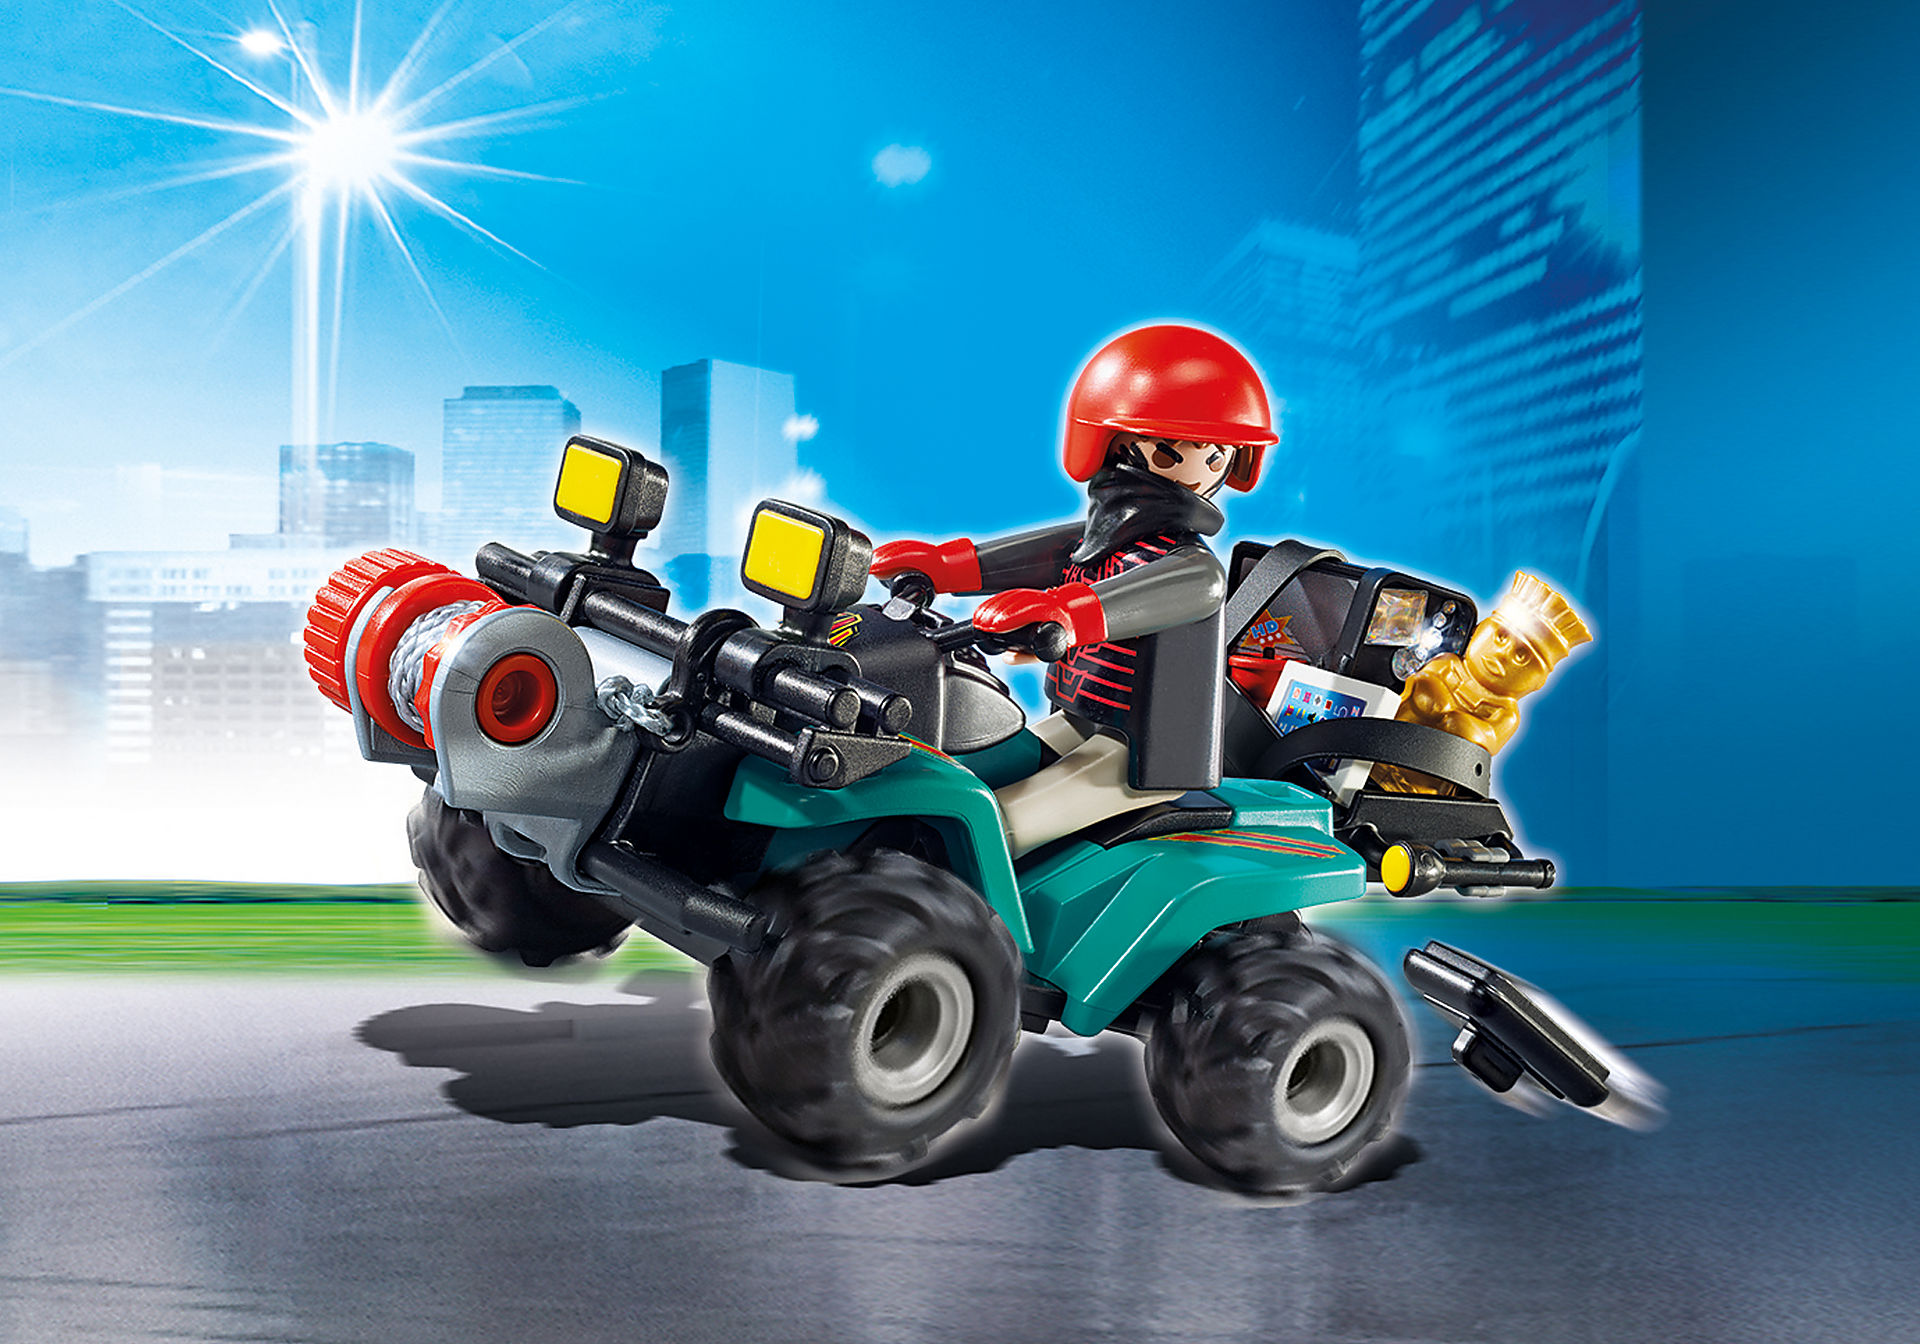 http://media.playmobil.com/i/playmobil/6879_product_detail/Ladrón con Quad y Botín